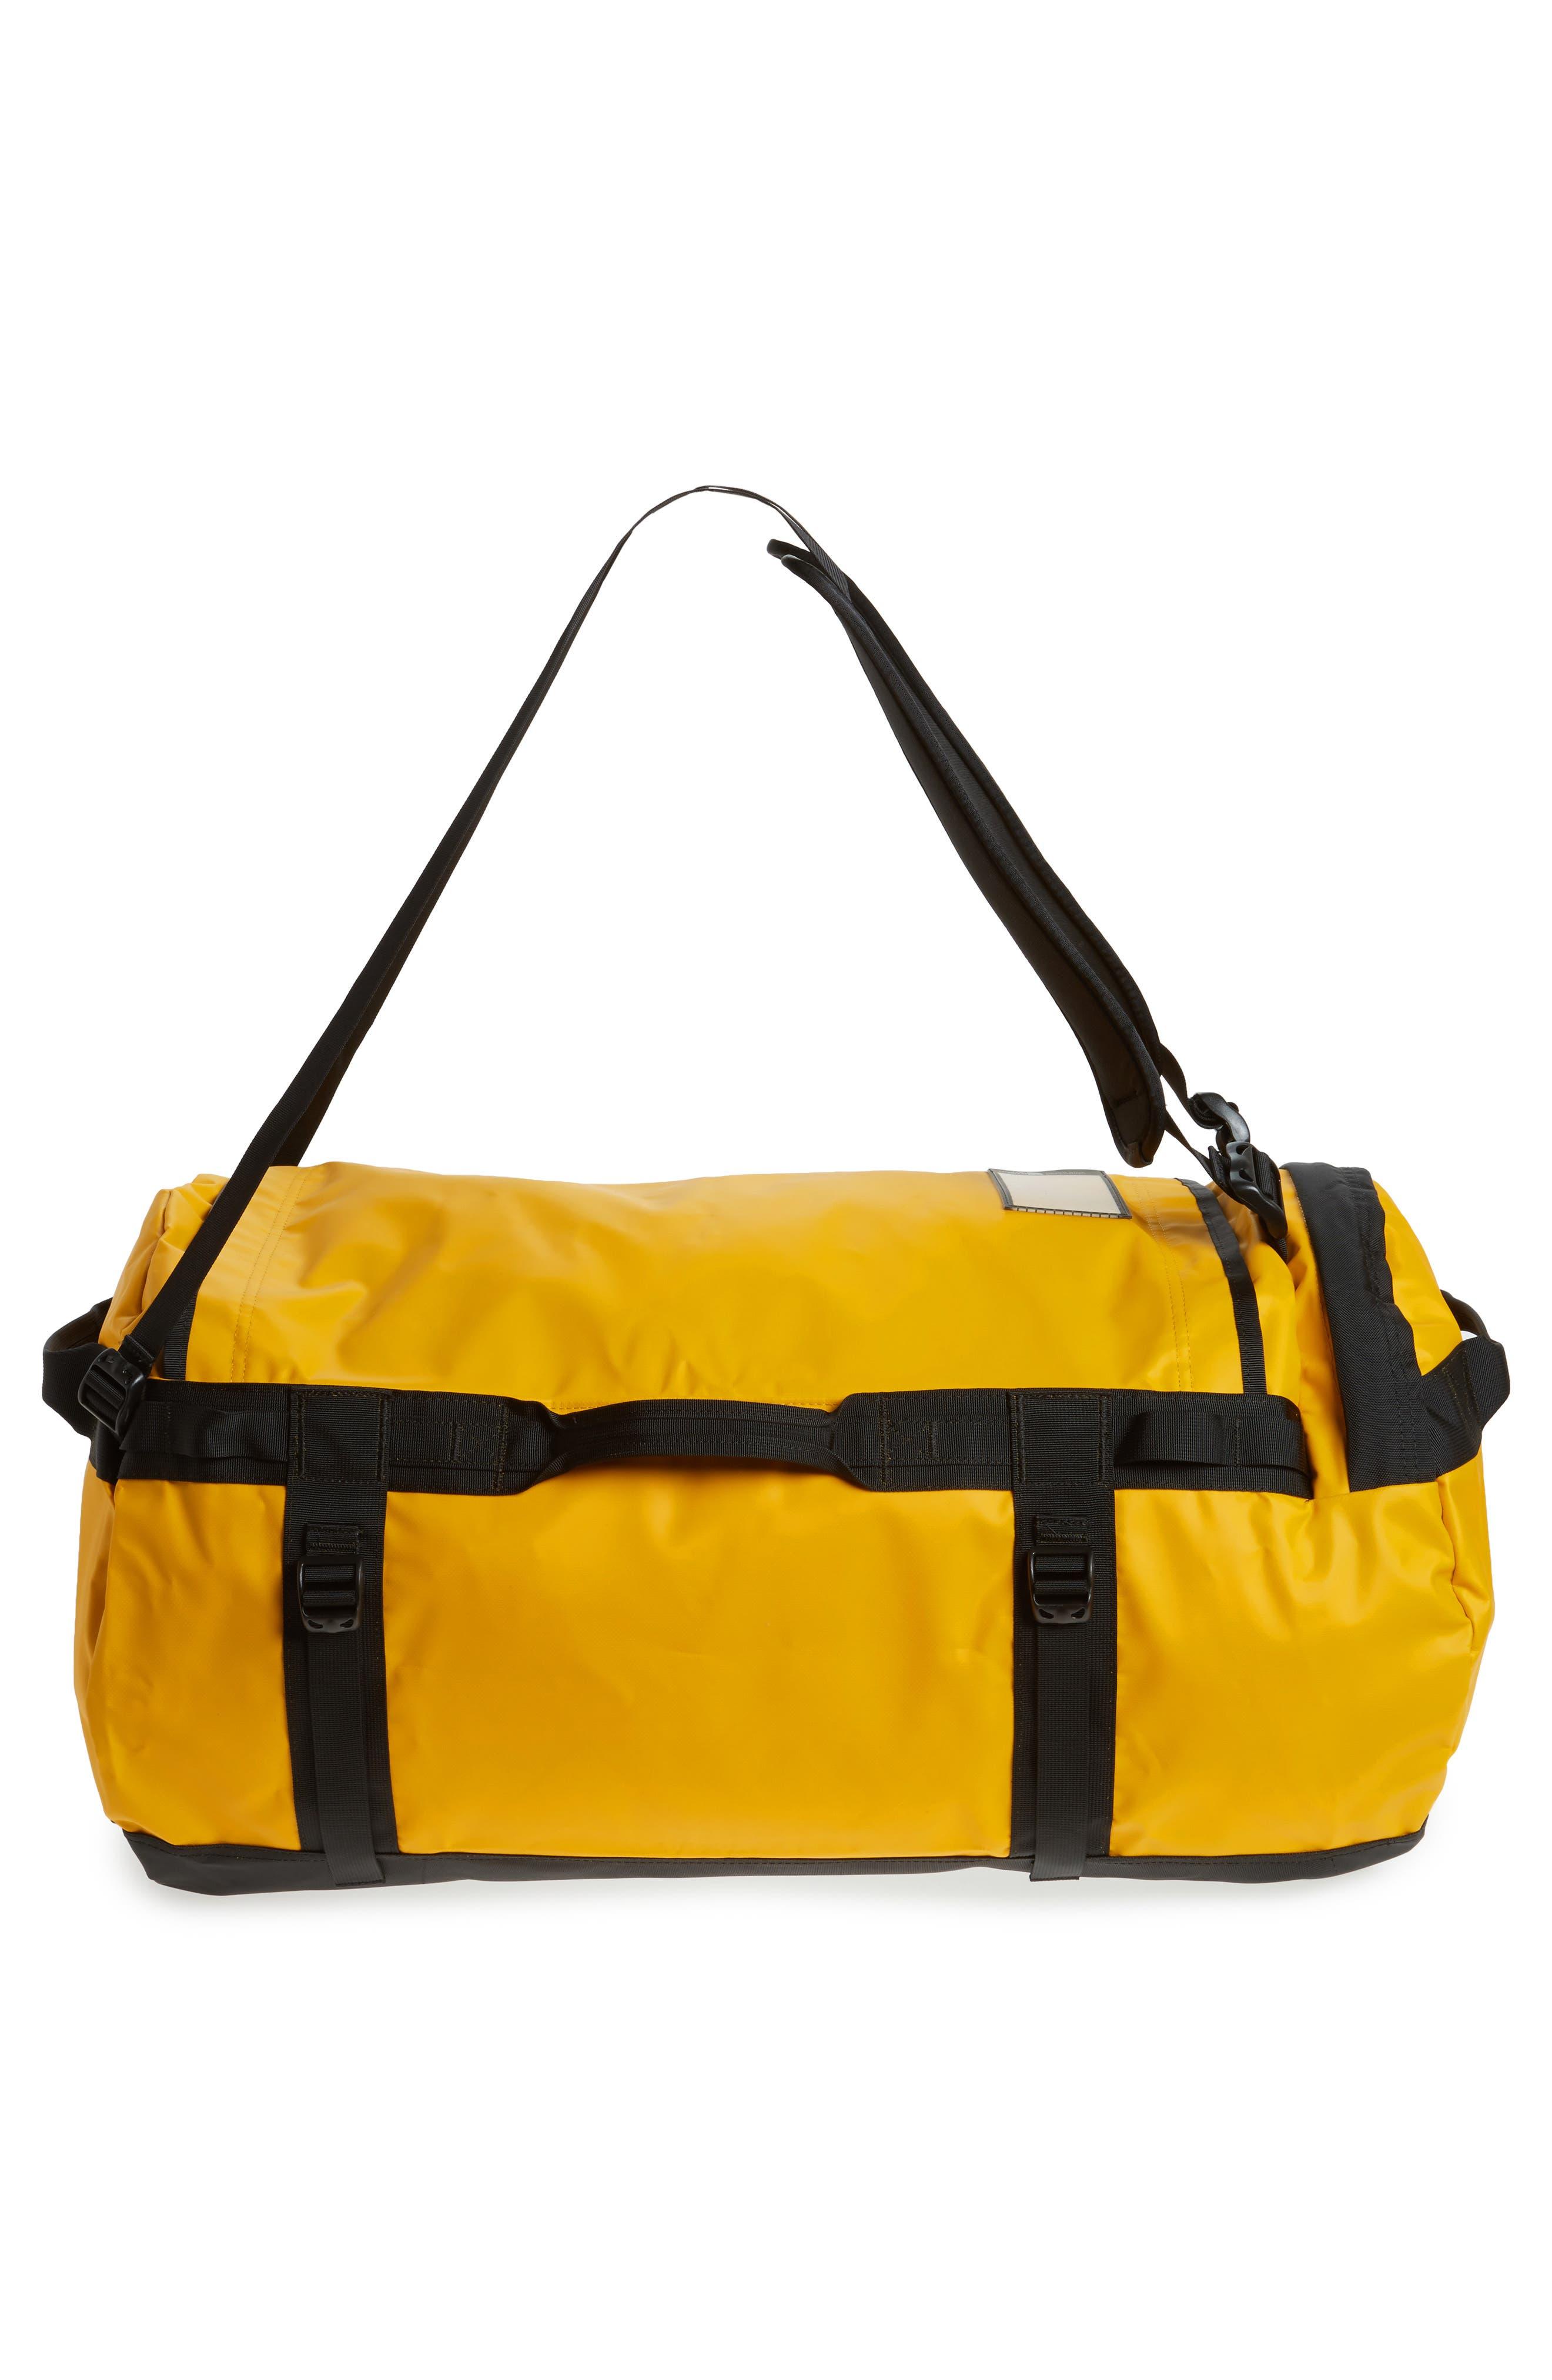 'Base Camp - Large' Duffel Bag,                             Alternate thumbnail 3, color,                             710